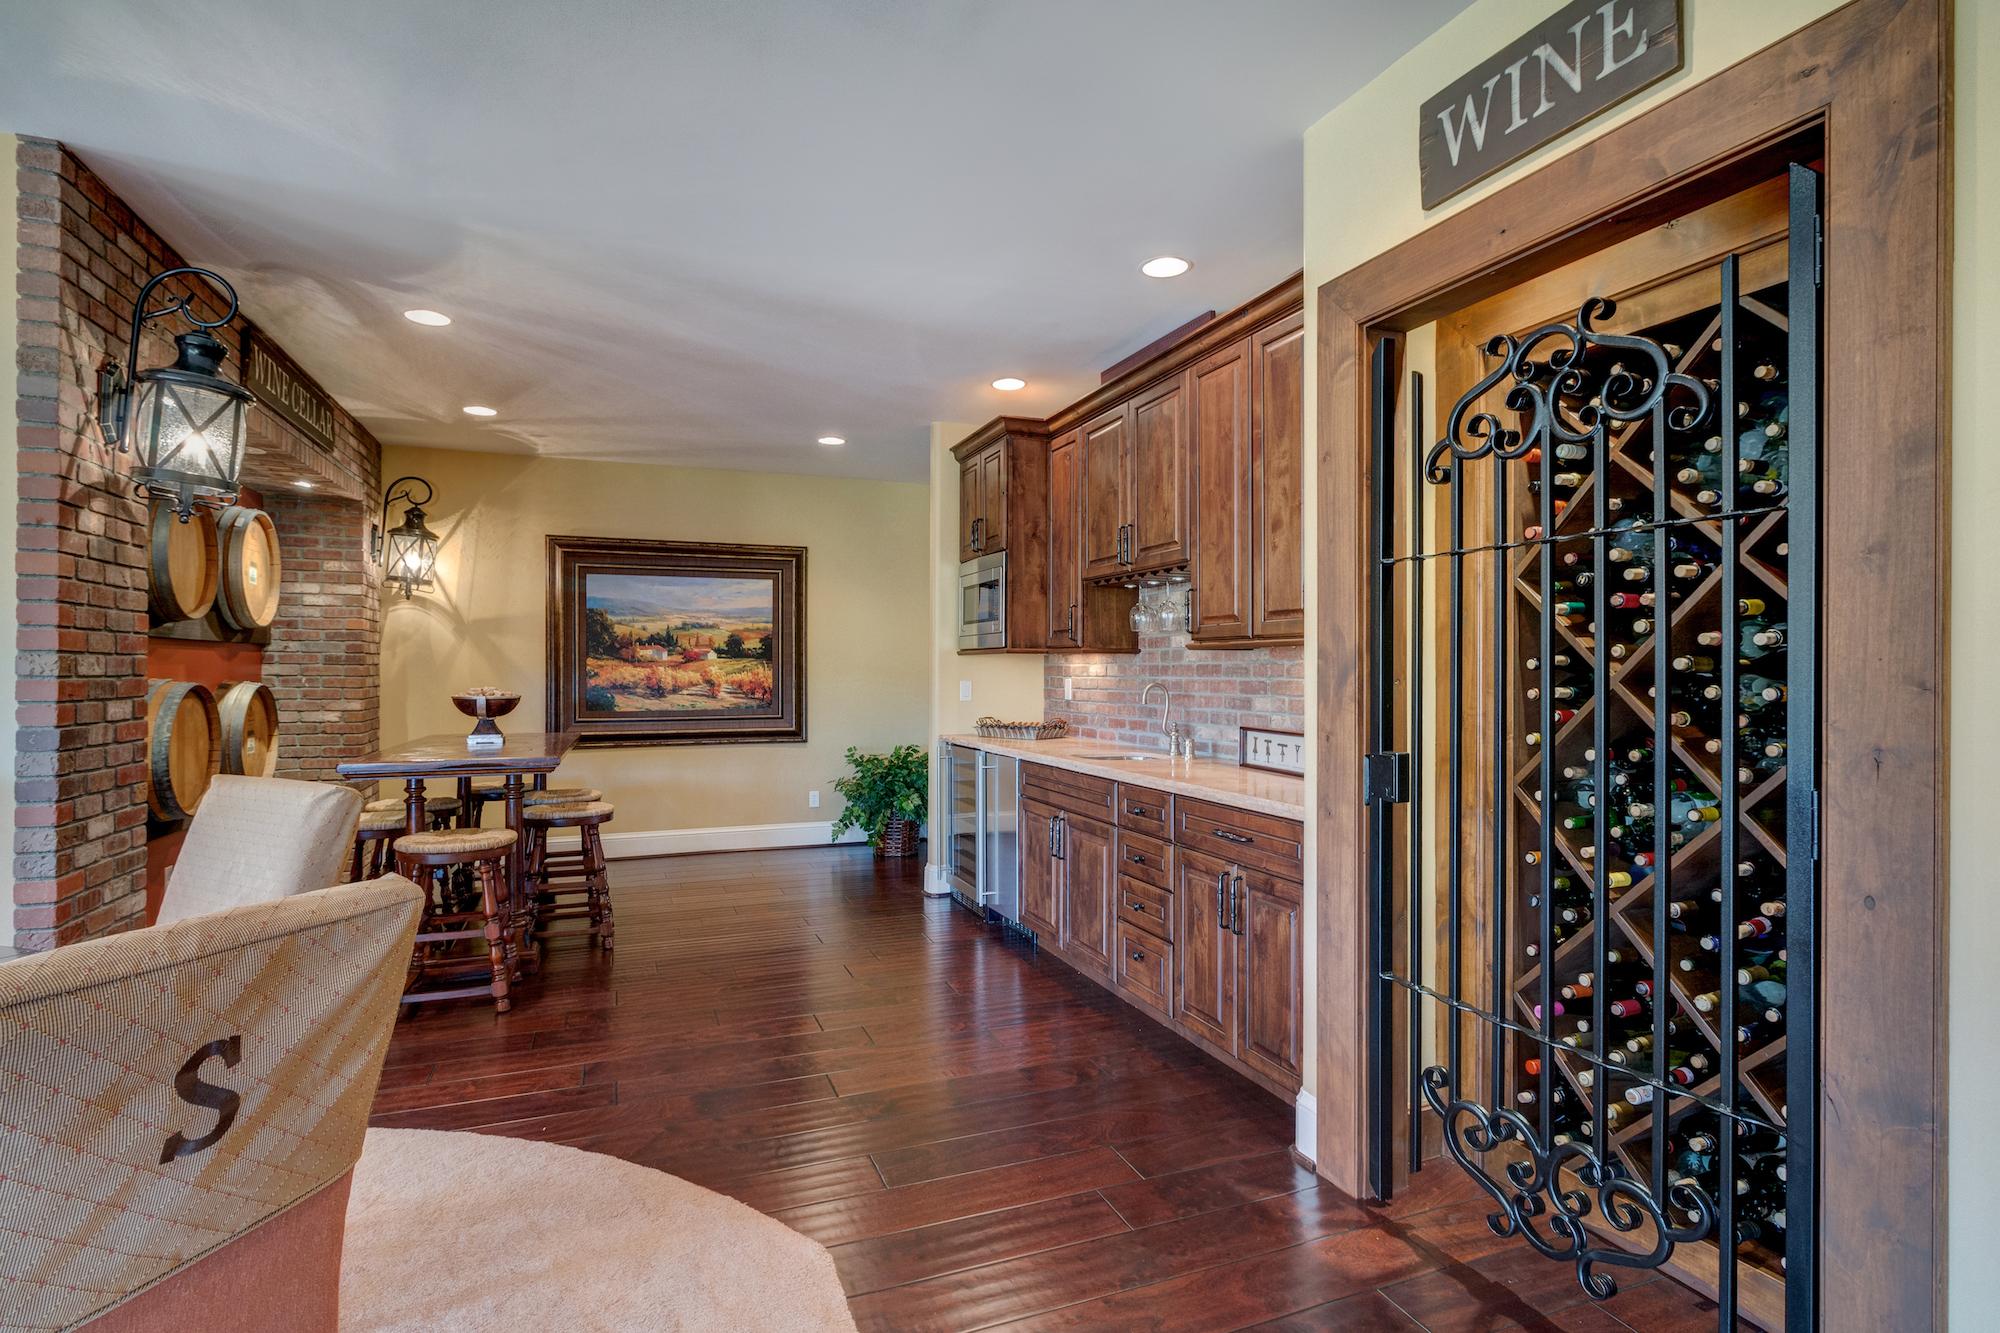 020-Wet bar area w wine fridge and ice maker.jpg